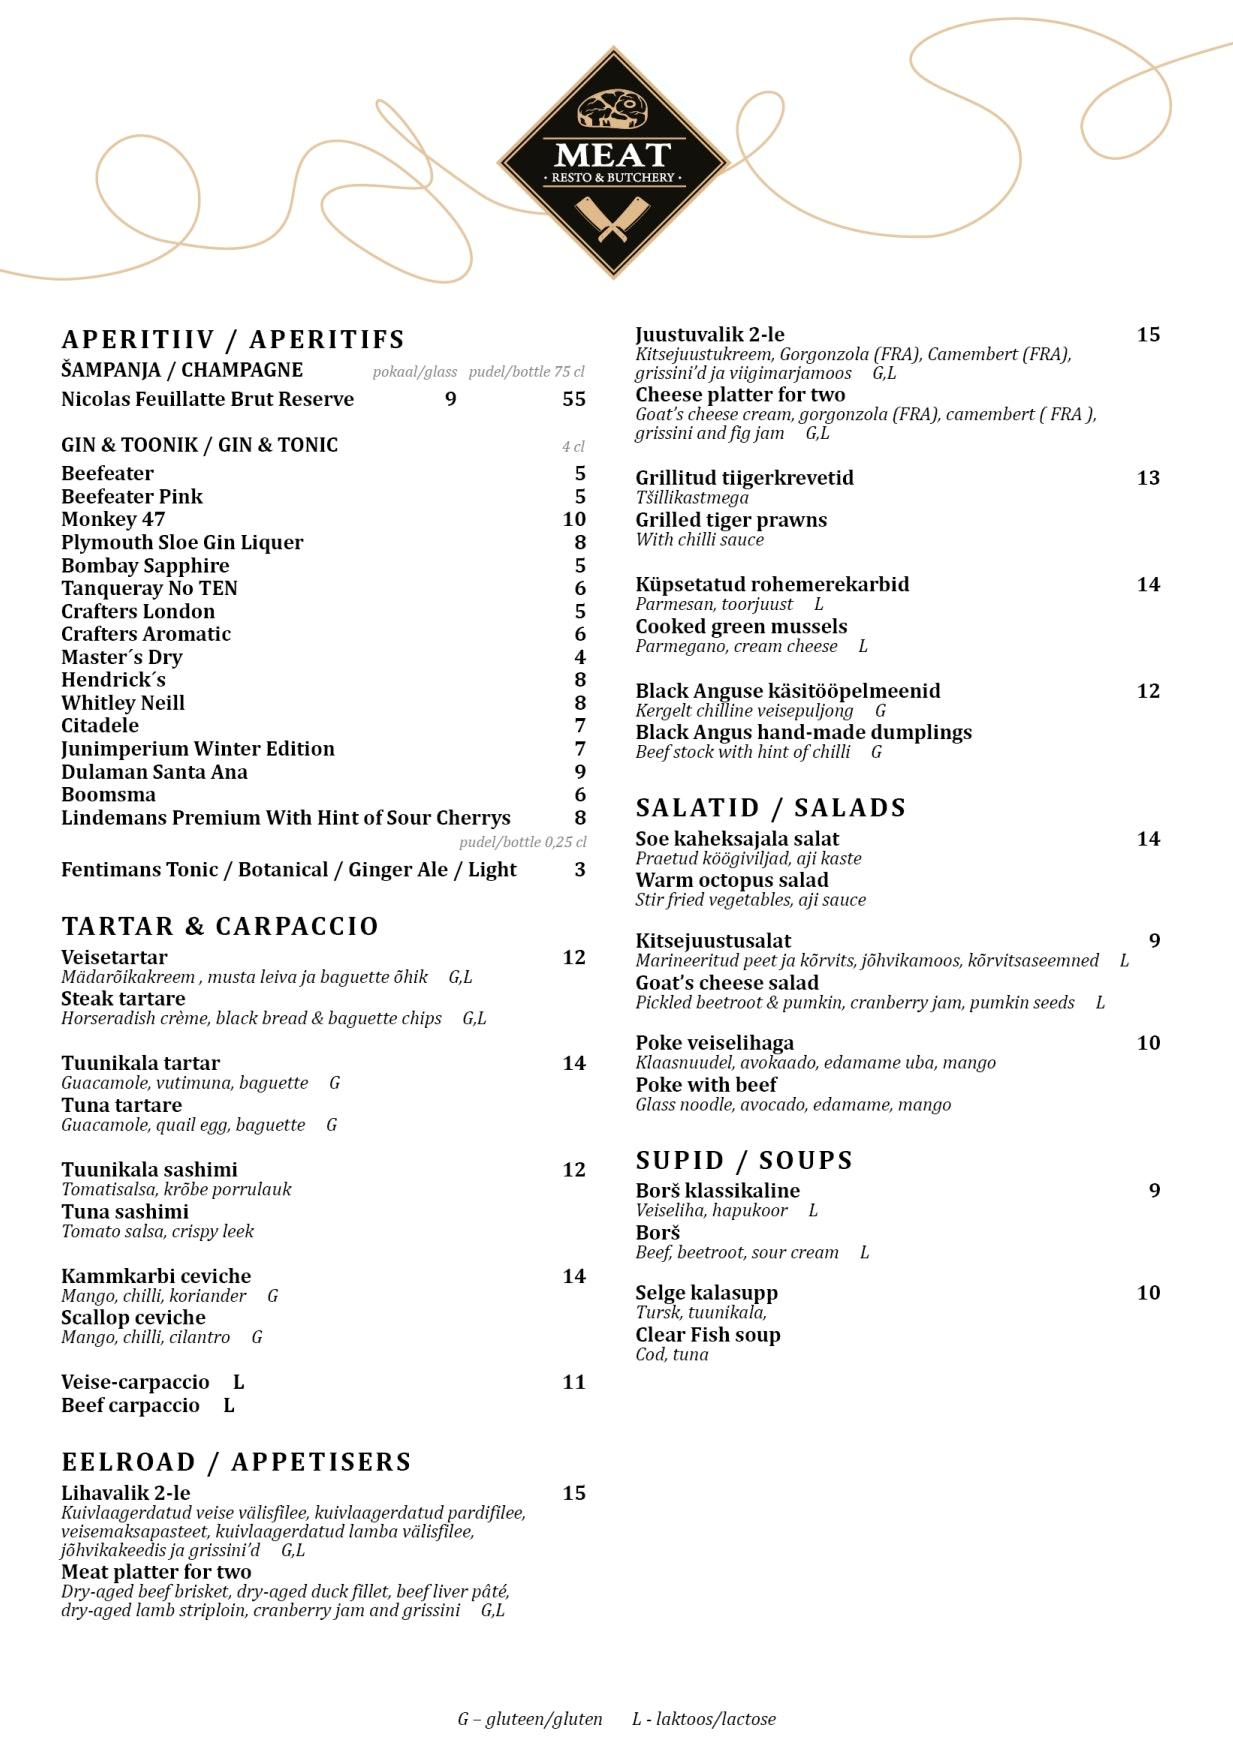 MEAT Resto & Butchery menu 4/5